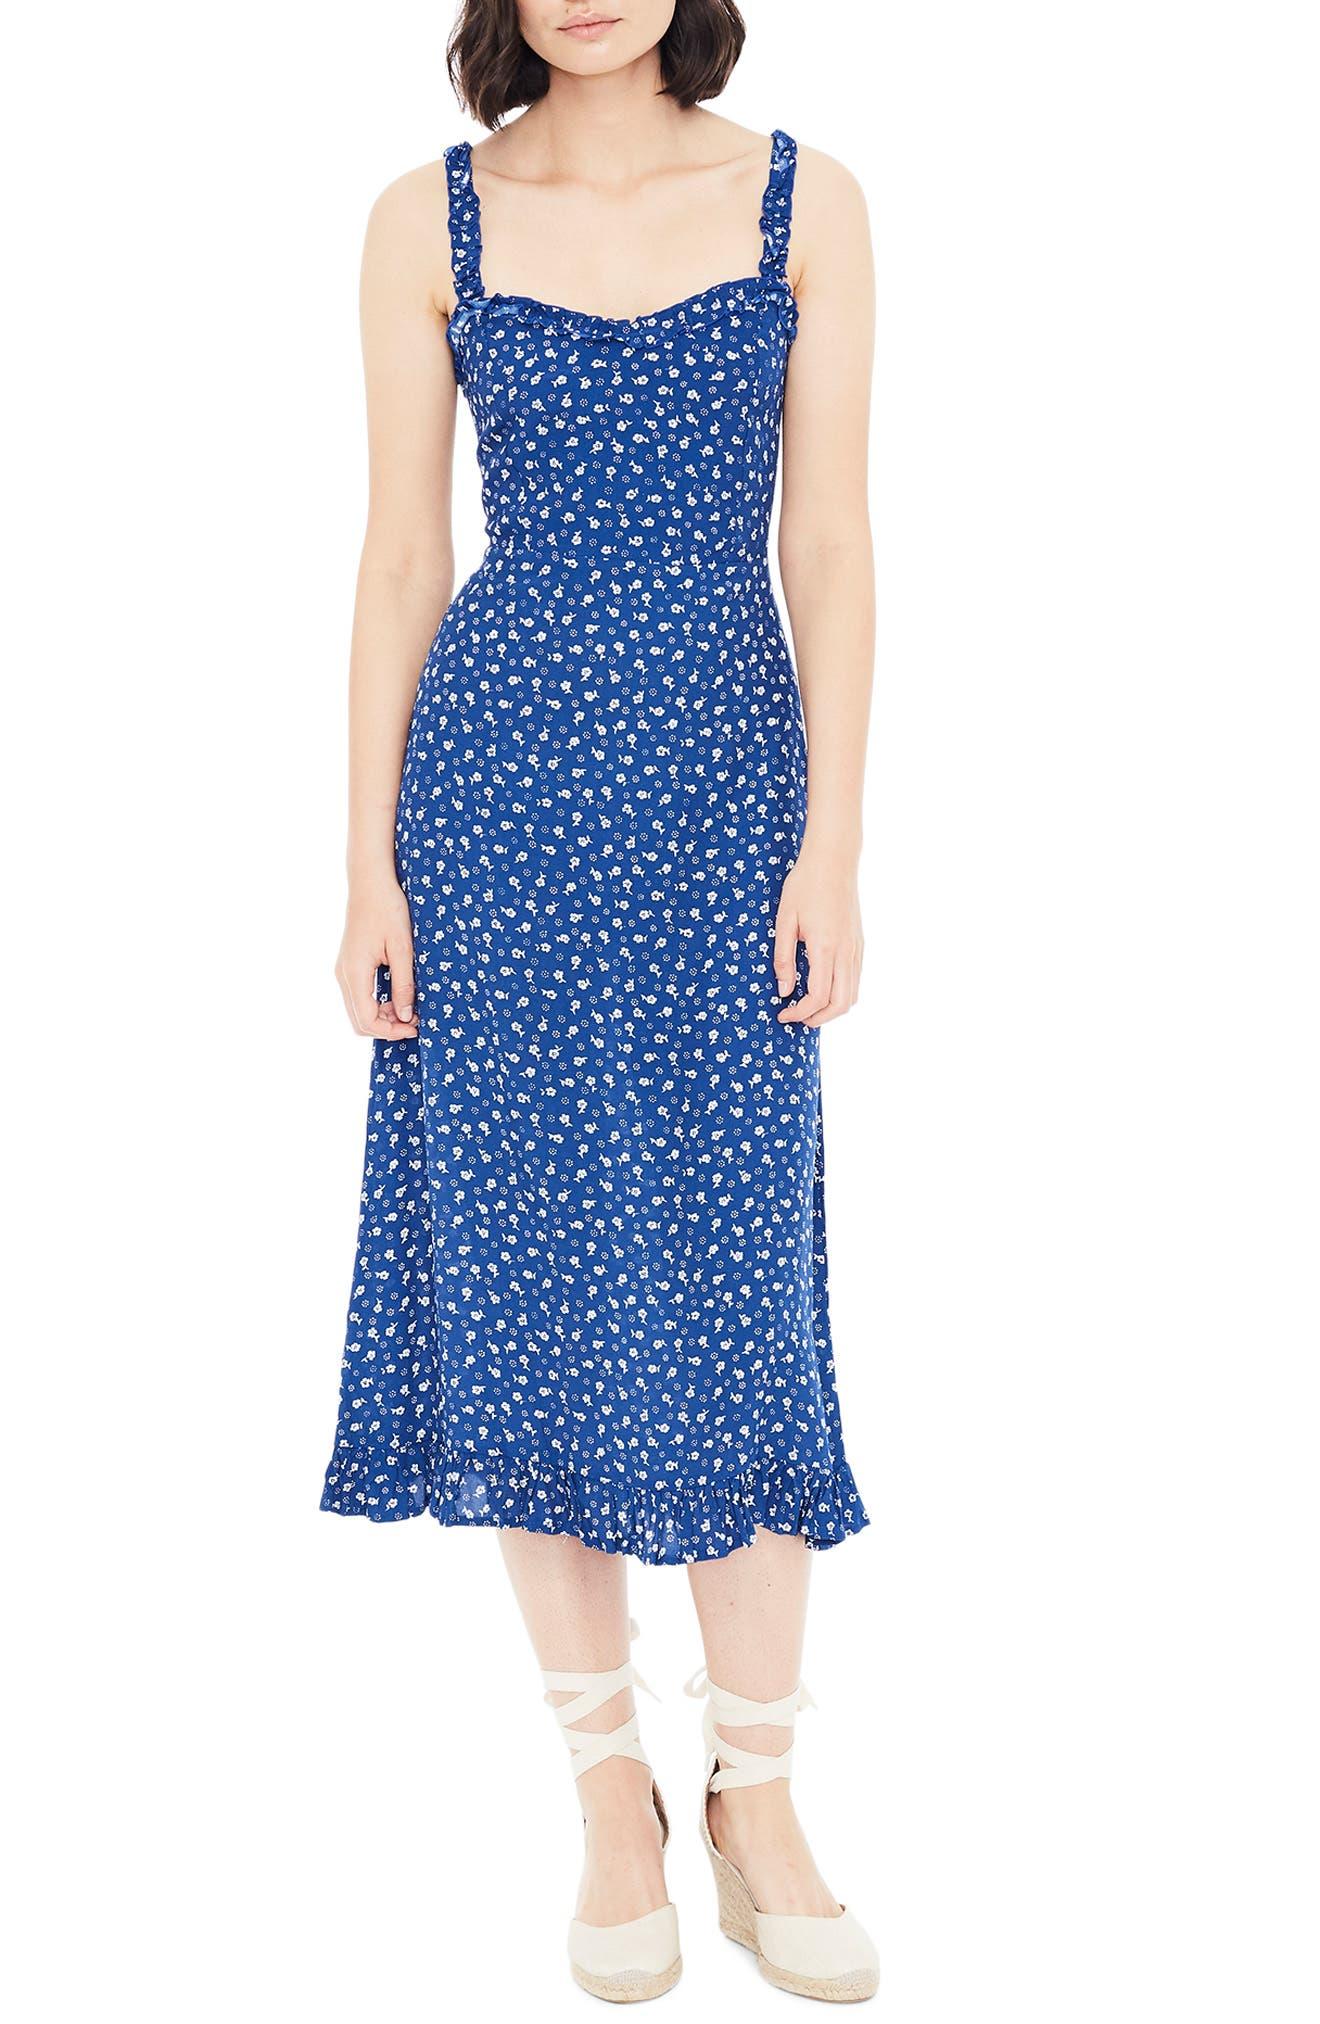 Faithfull The Brand Noemie Blue Floral Sundress, Blue